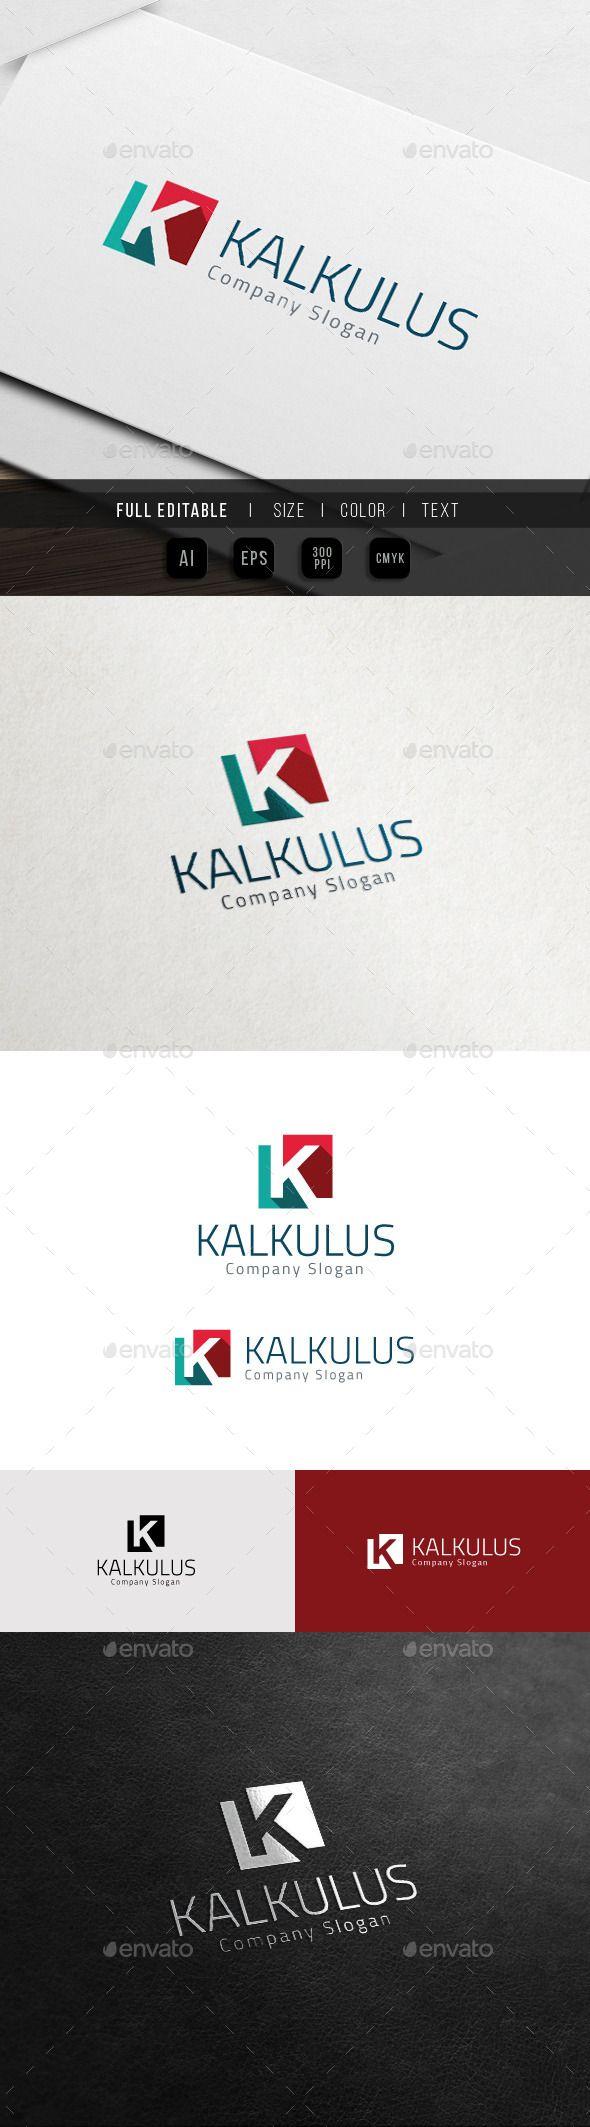 Corporate Brand - Marketing Finance - K Logo - Letters Logo Templates